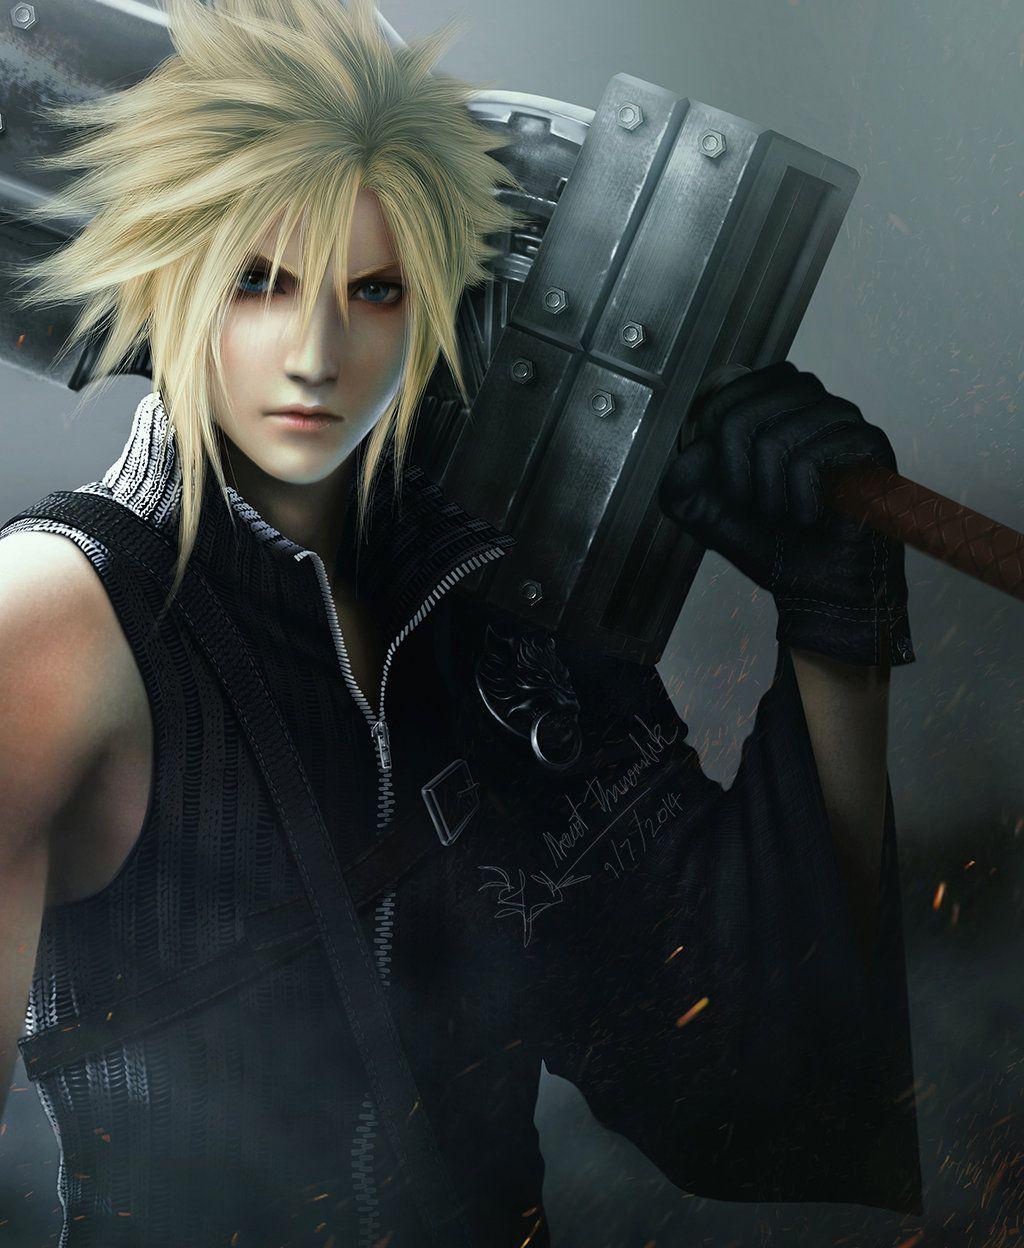 Final Fantasy Cloud Strife Wallpaper: Cloud By Thanomluk By Thanomluk.deviantart.com On